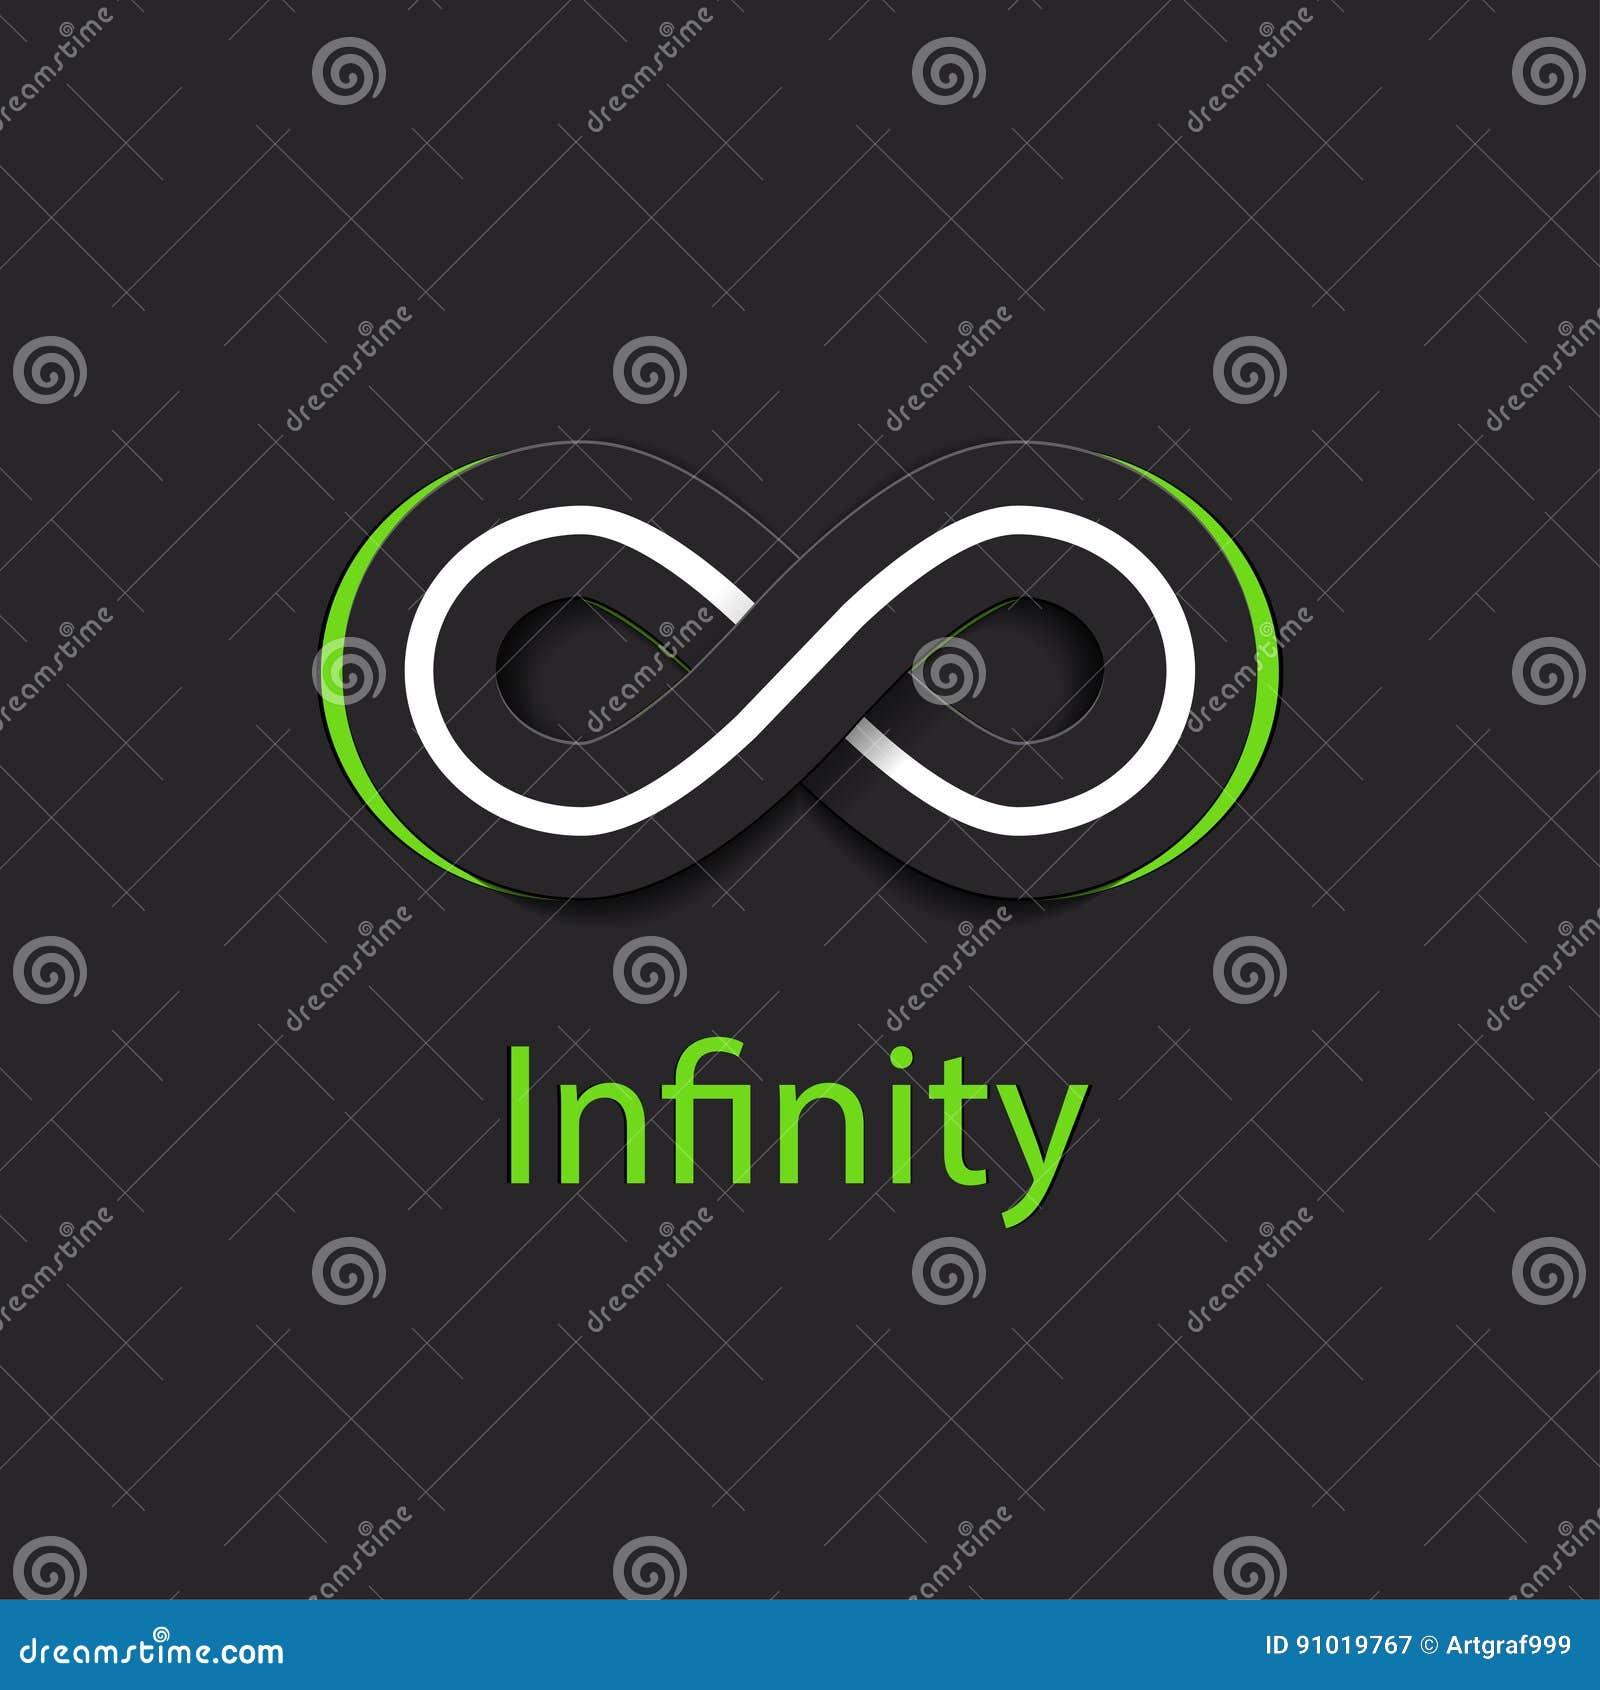 Infinity symbol logo vector illustration stock vector infinity symbol logo vector illustration biocorpaavc